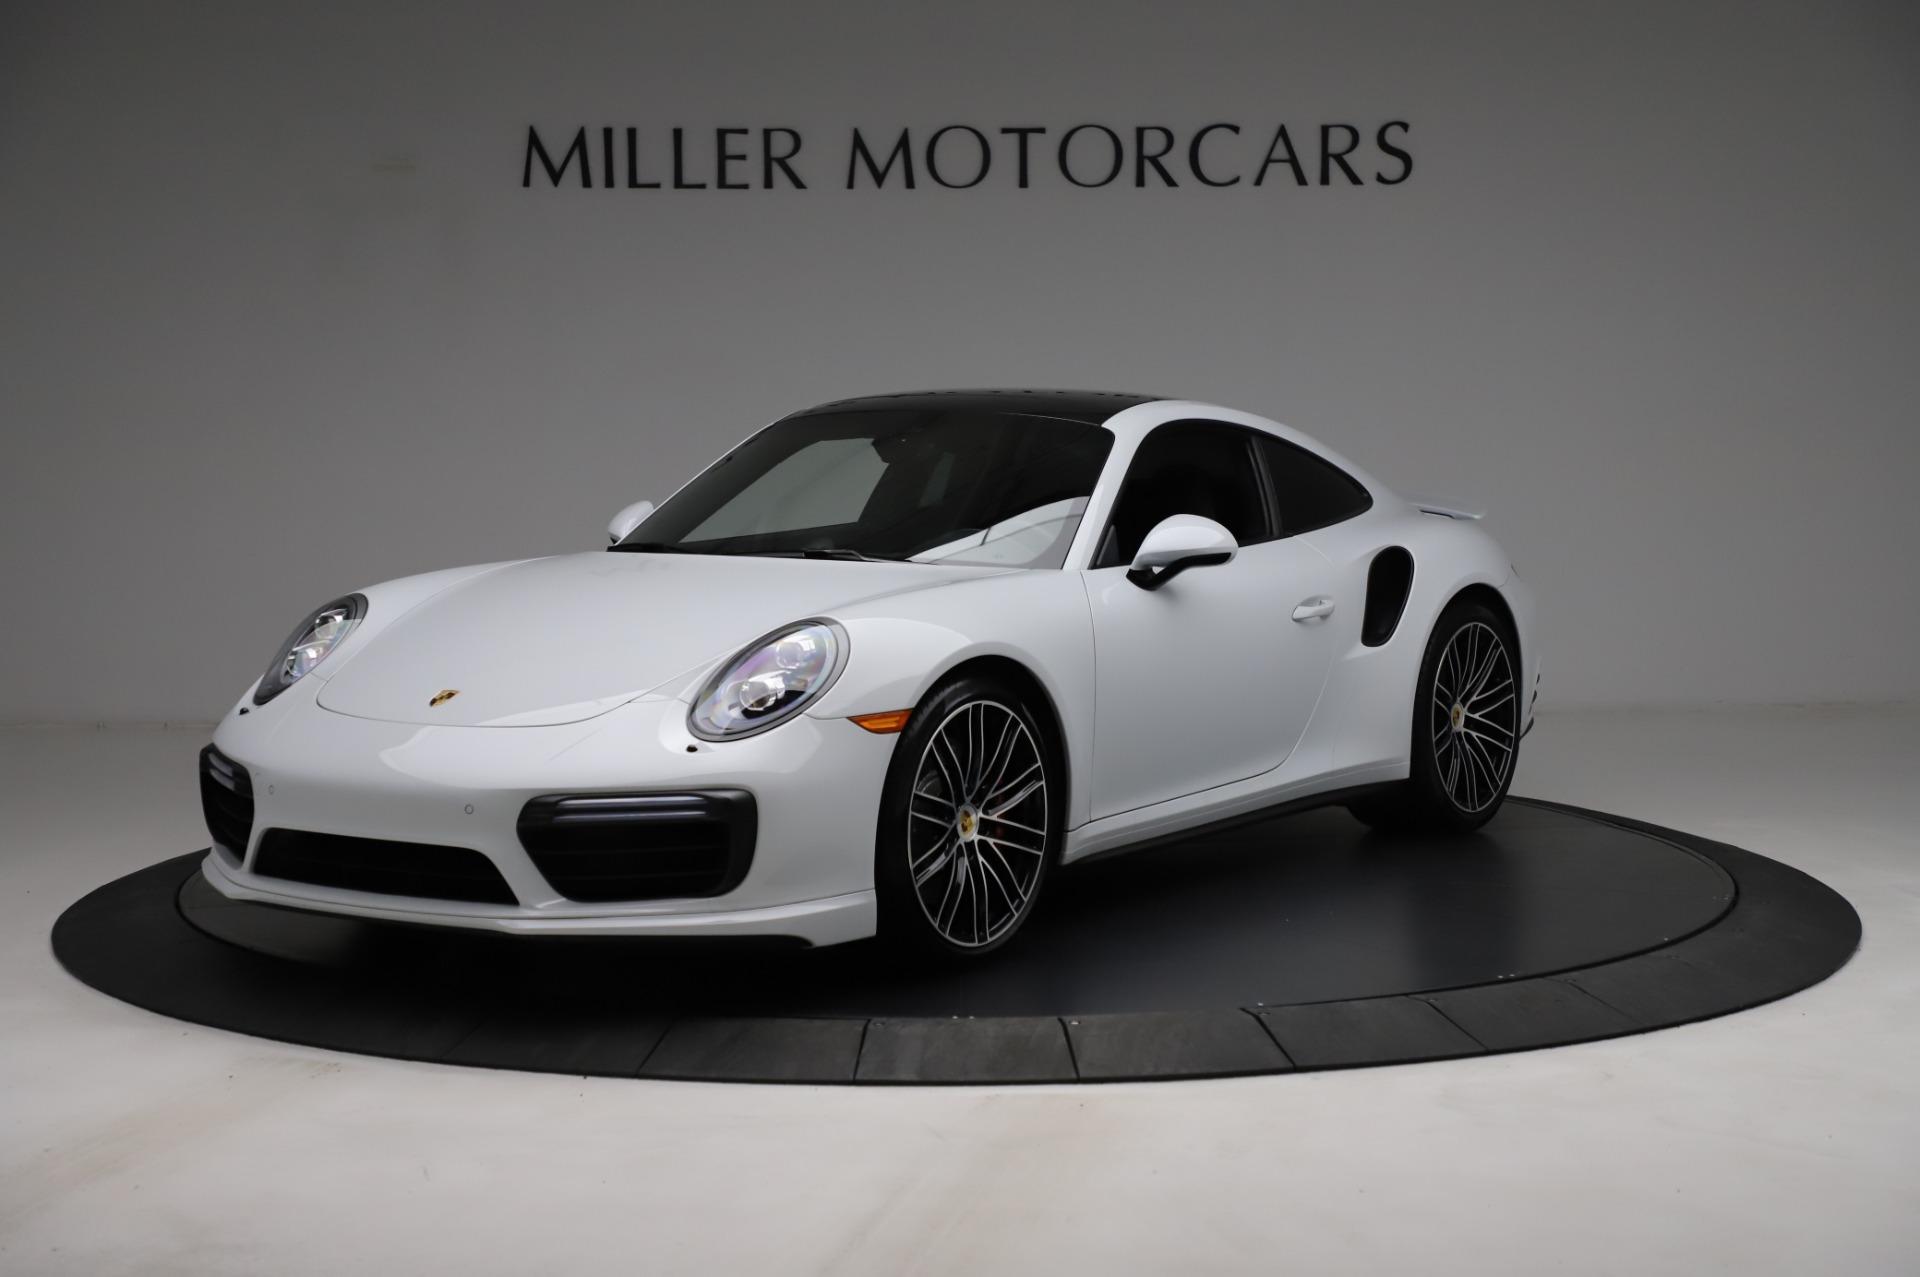 Used 2018 Porsche 911 Turbo for sale $159,990 at Alfa Romeo of Westport in Westport CT 06880 1